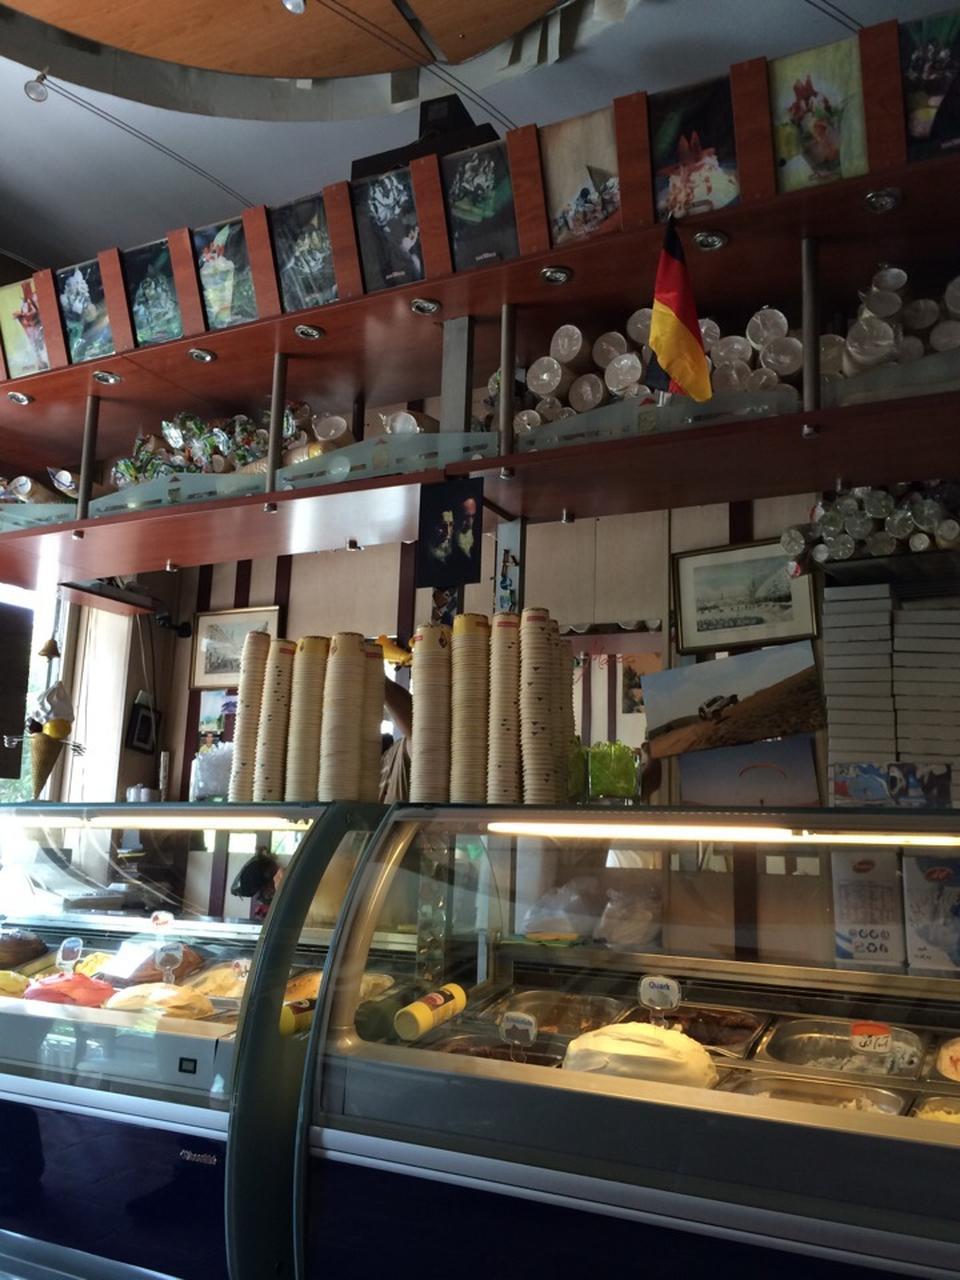 عکس پروفایل آبمیوه و بستنی بستنی سن مارکو